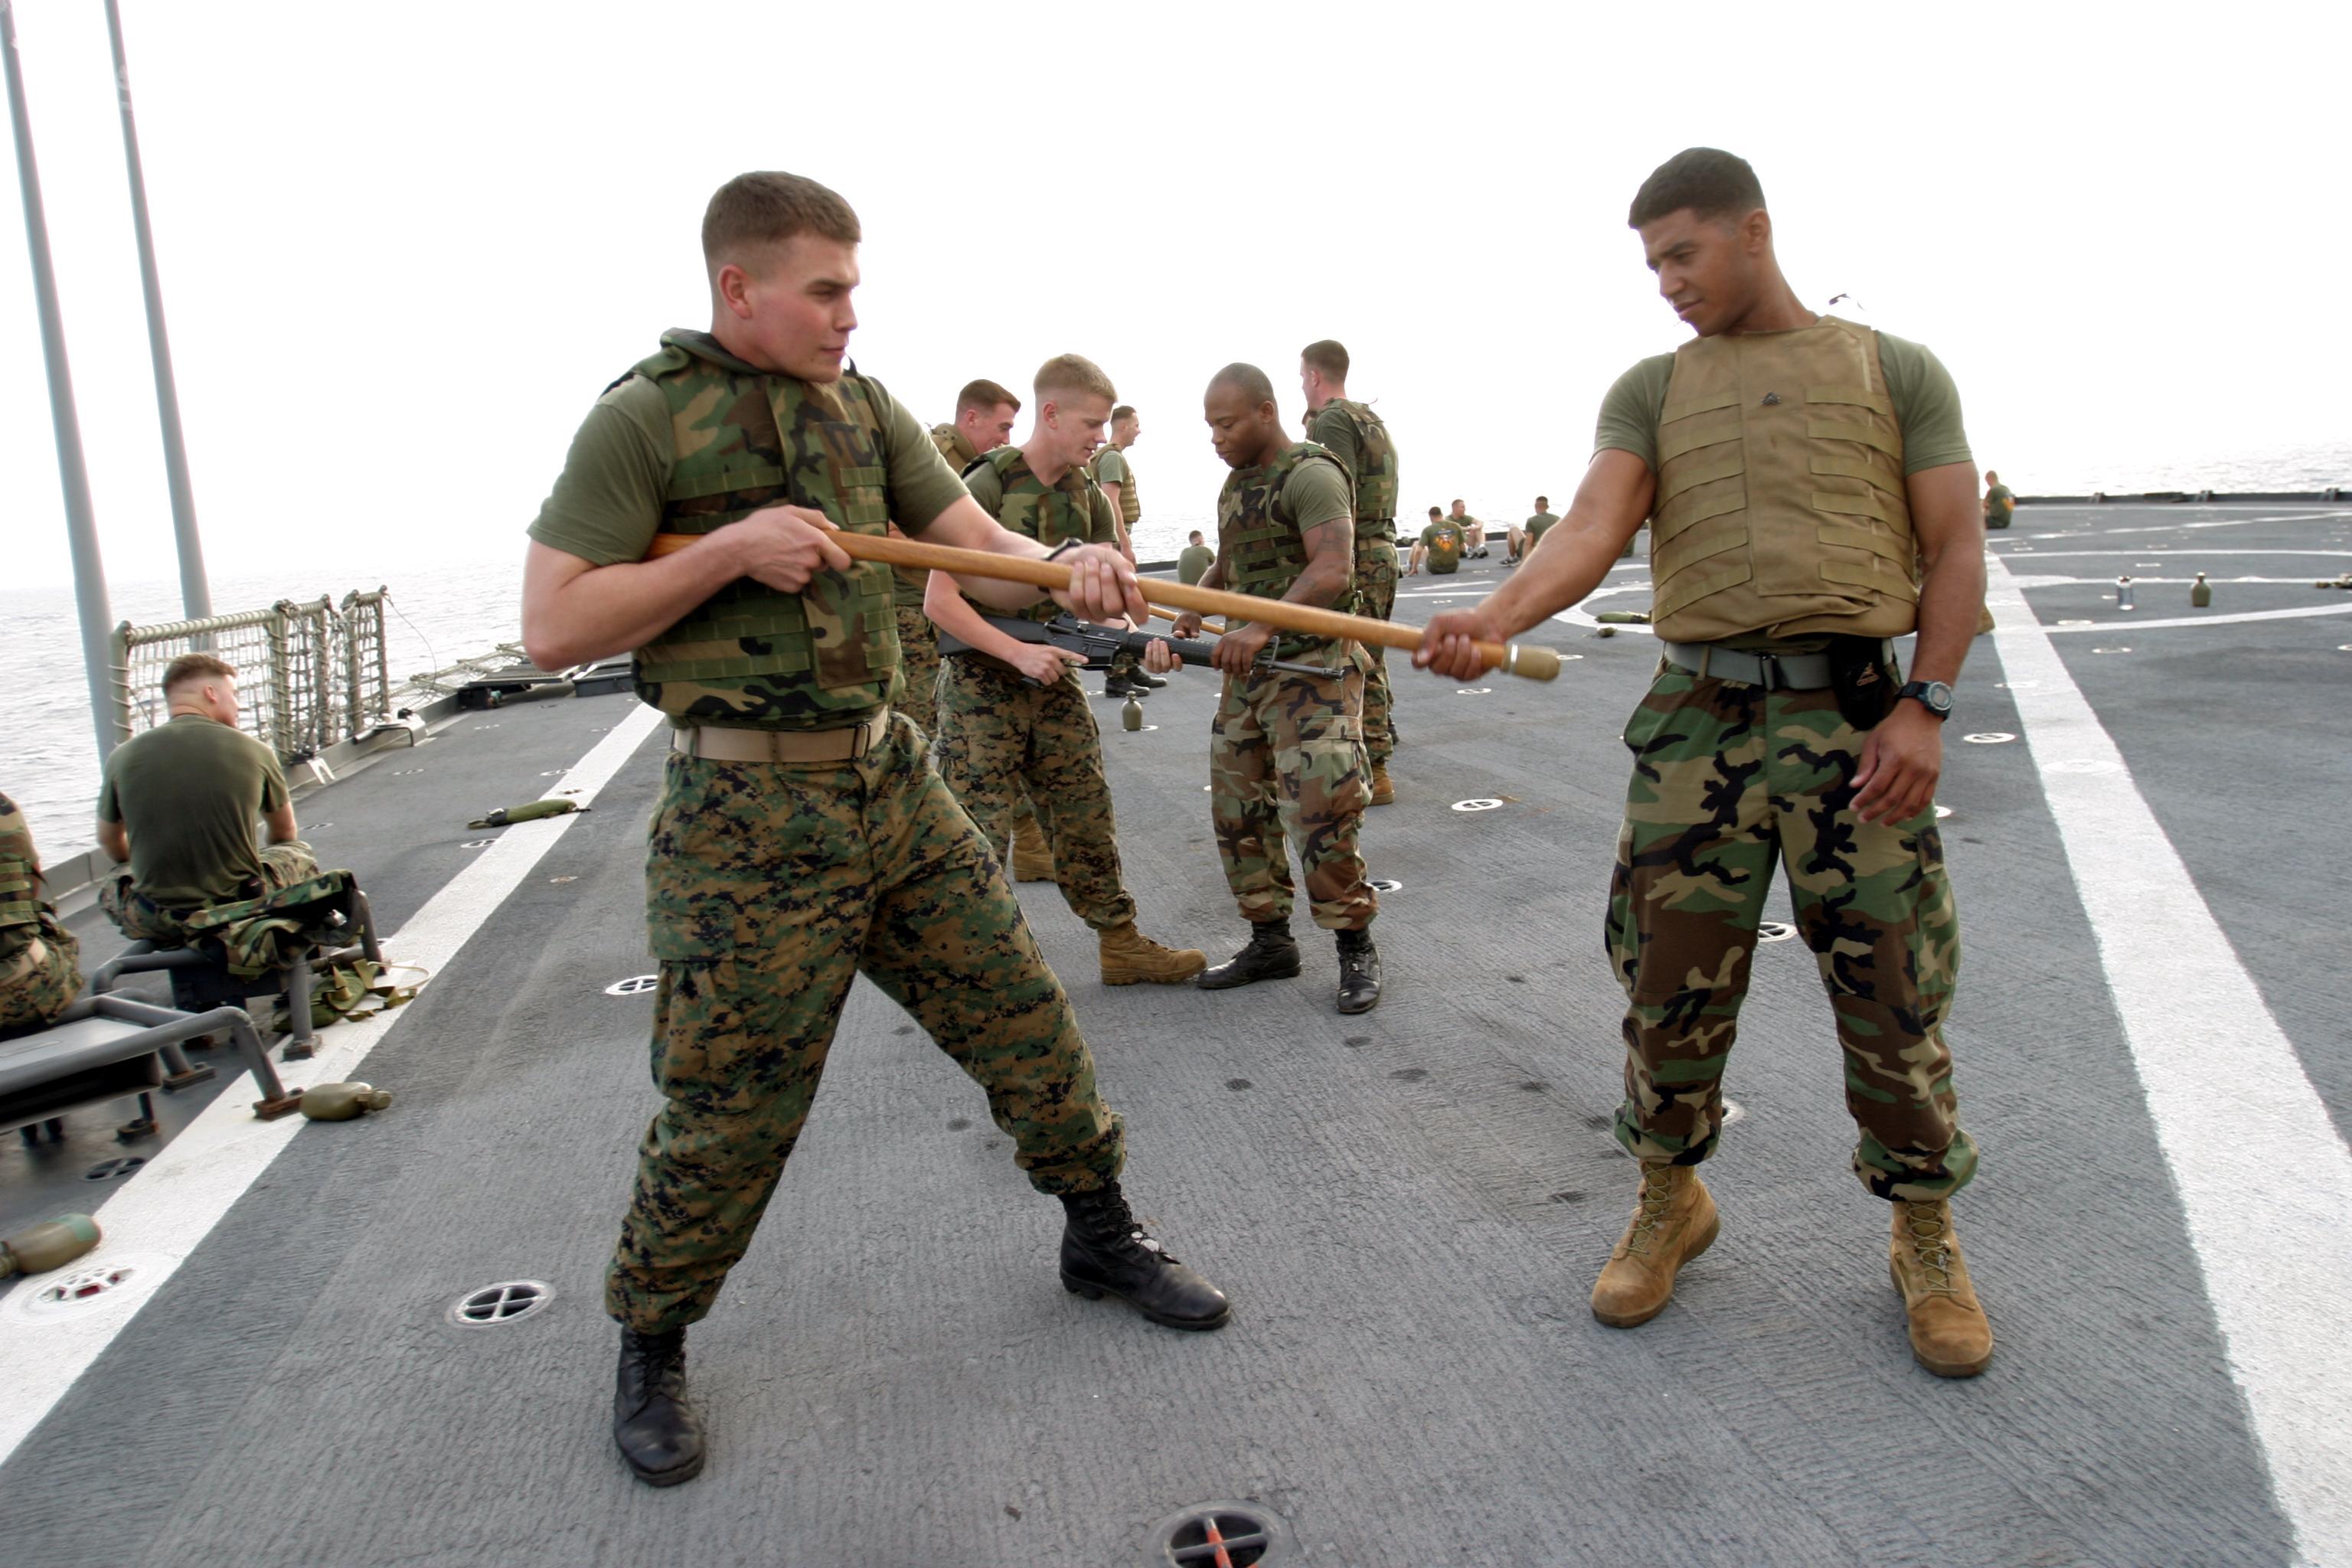 File:US Navy 040220-M-4806Y-022 Lance Cpl. Hunter Foskey, left ...